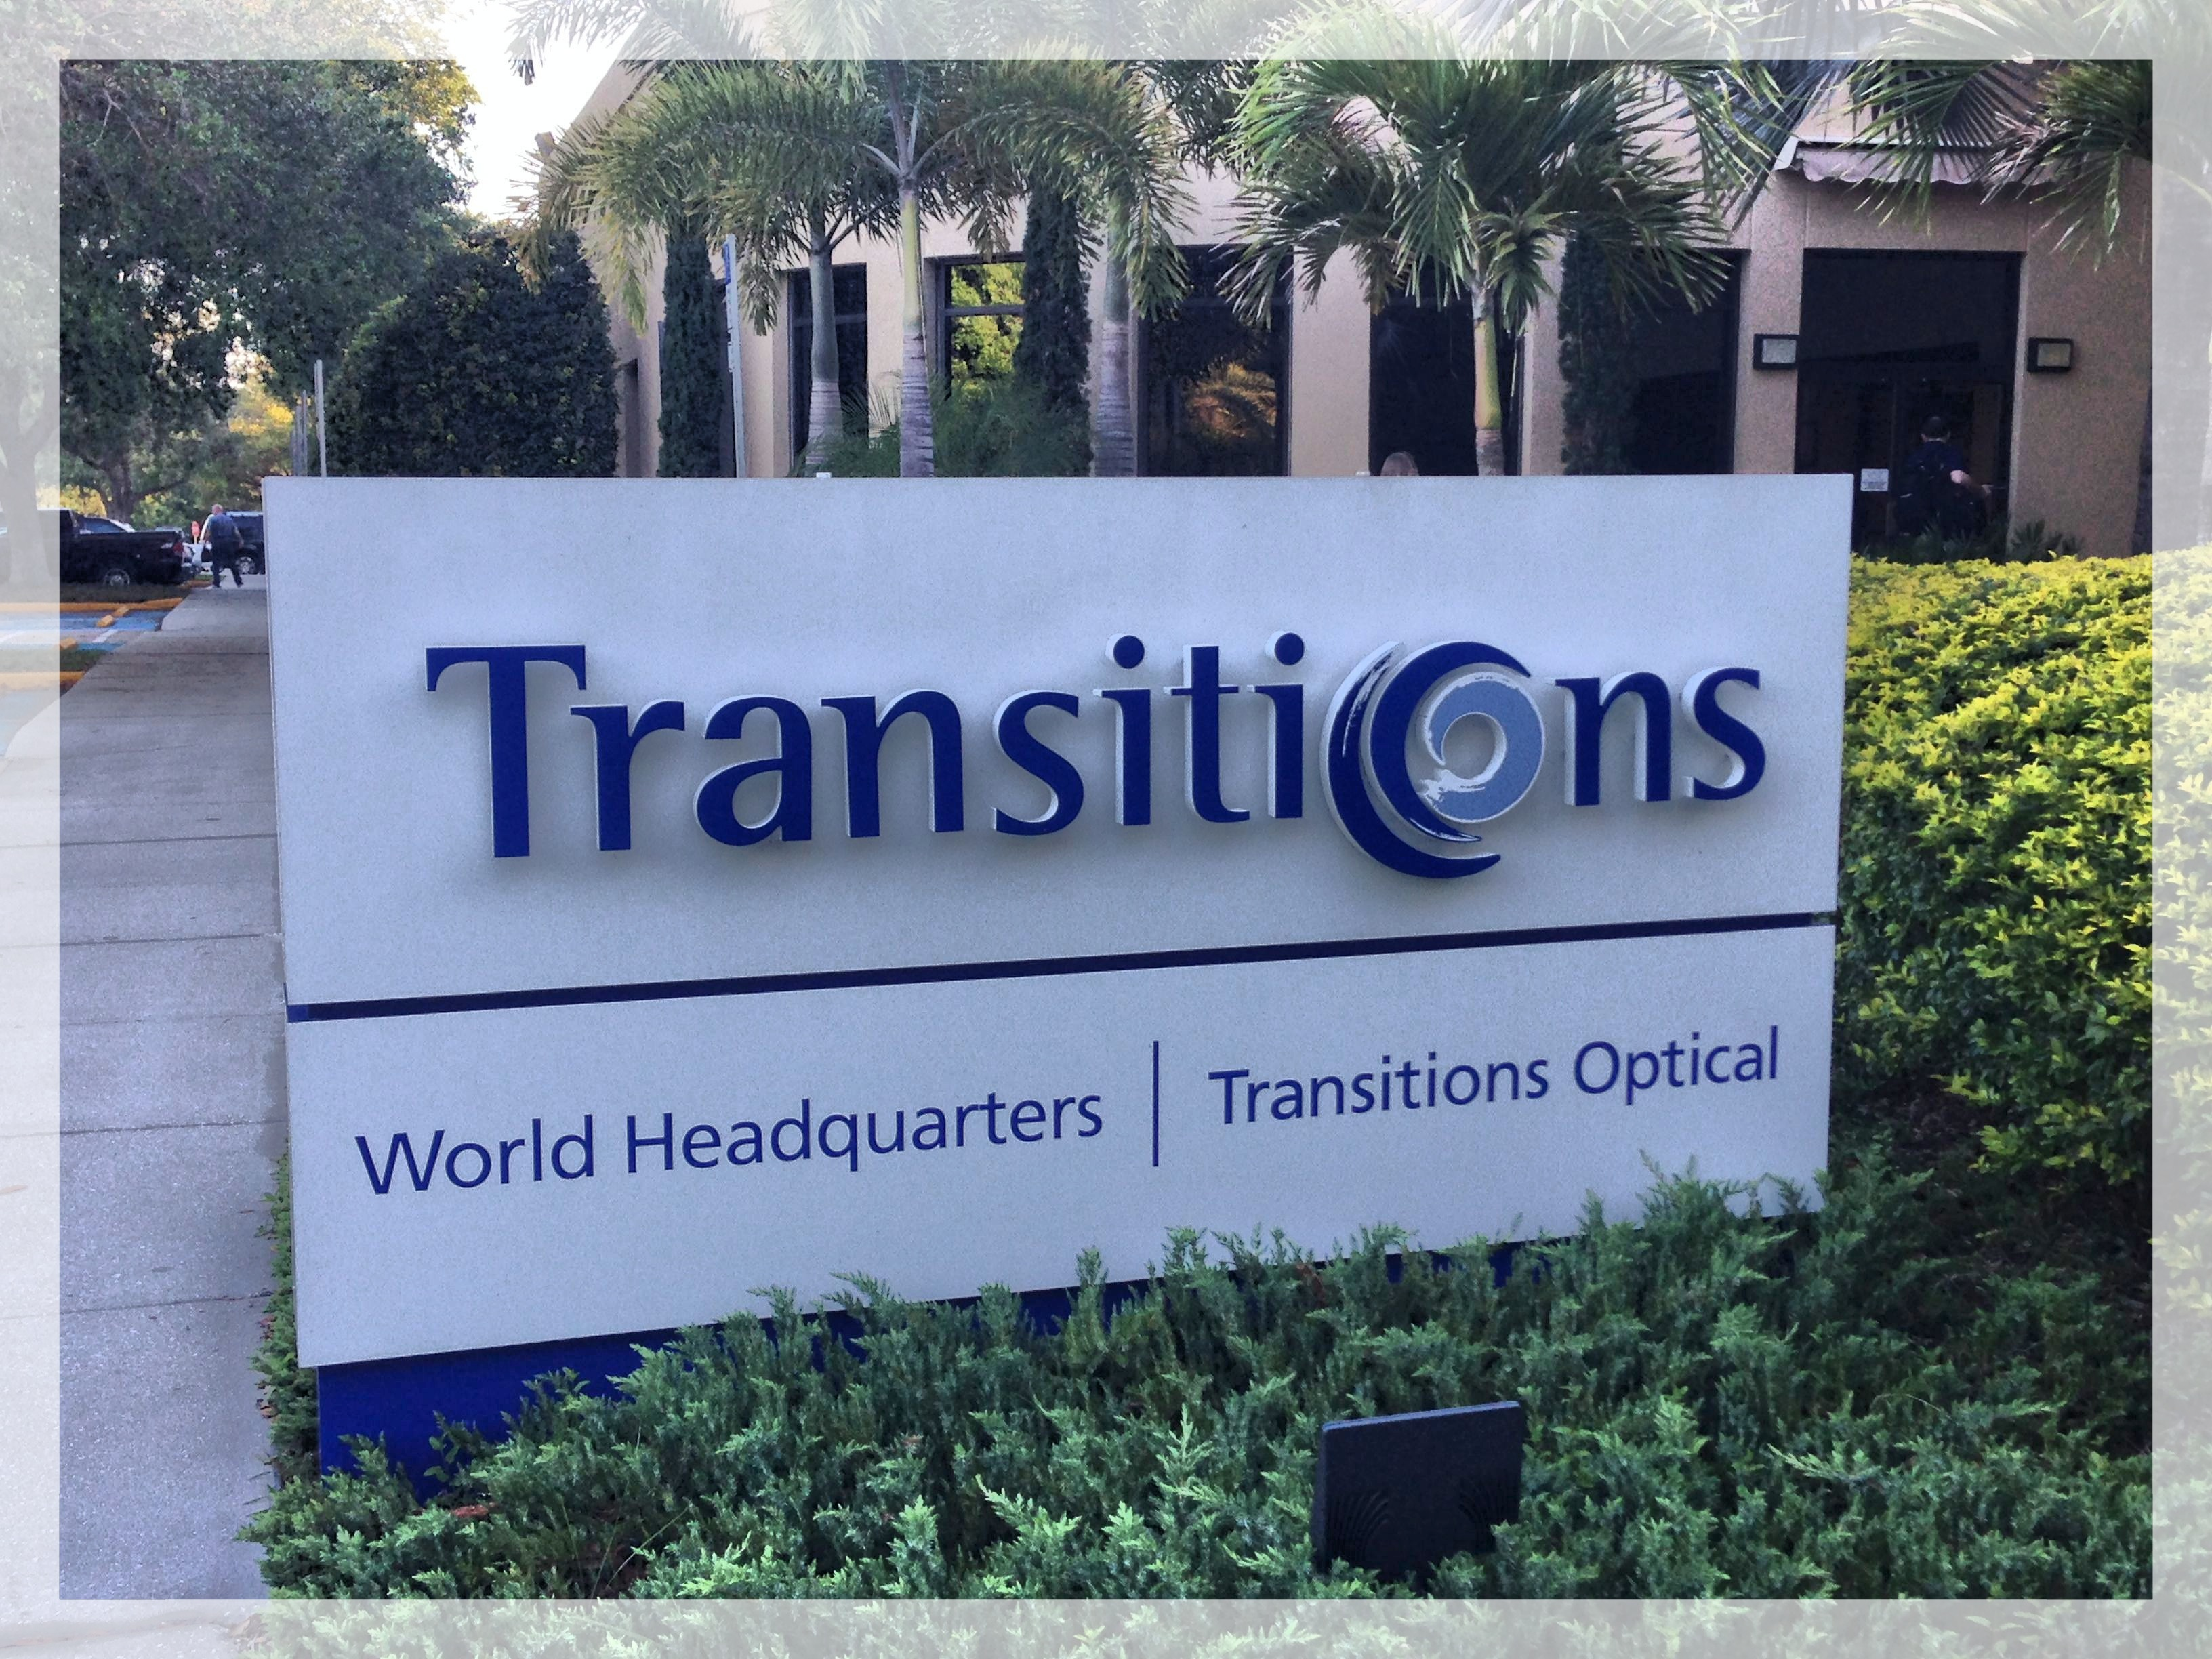 Transitions Optical World Headquarters